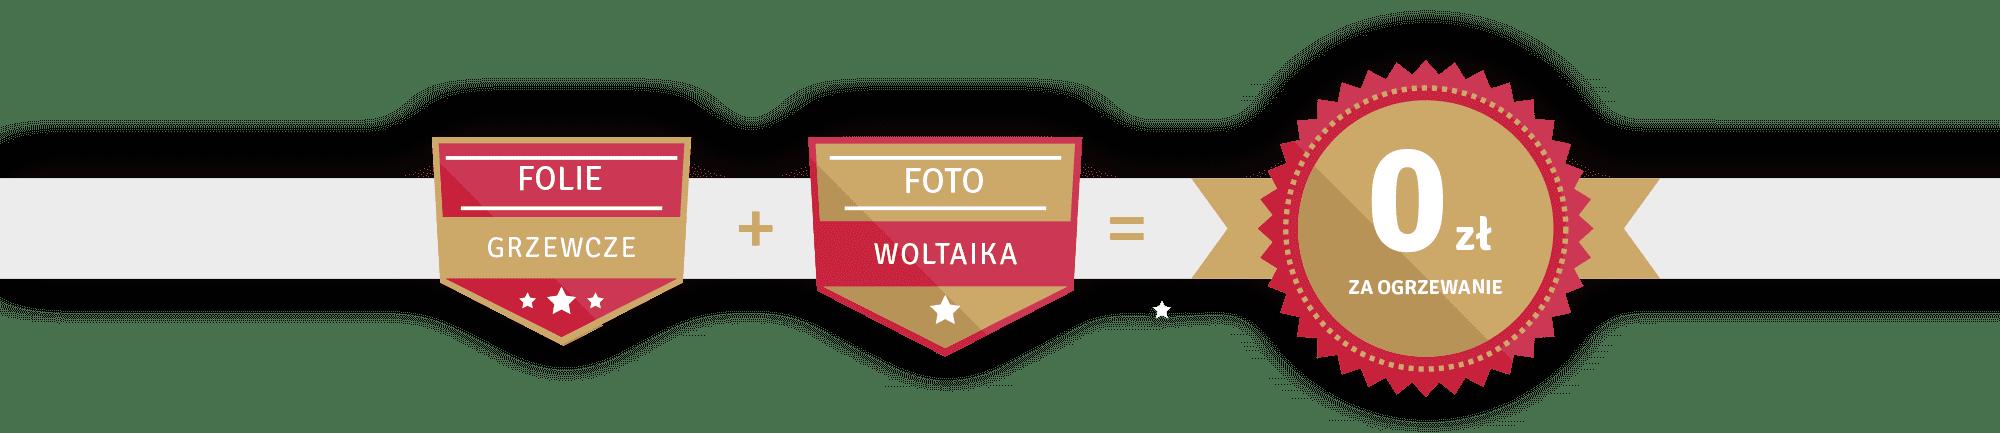 folie_foto